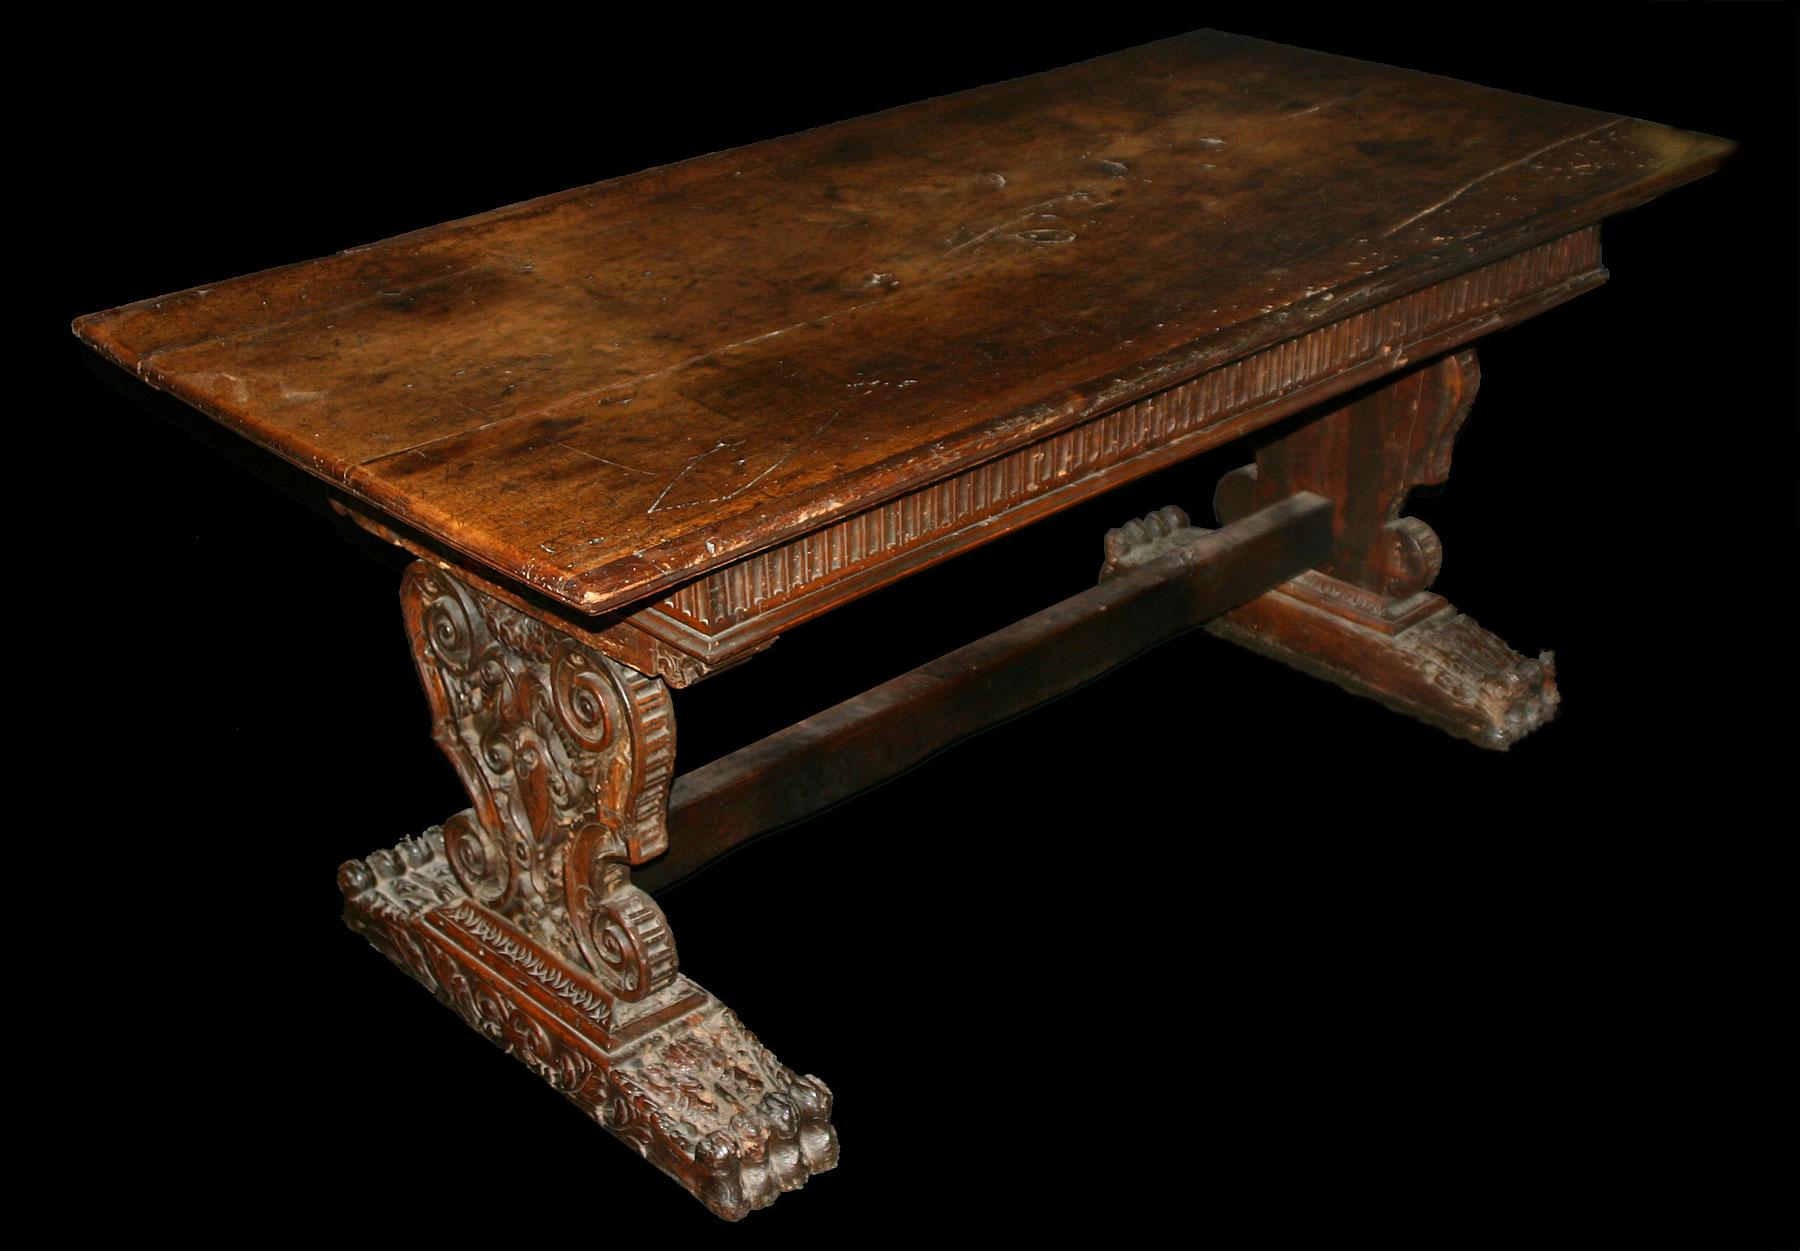 Italian Renaissance Period Walnut Refectory Table